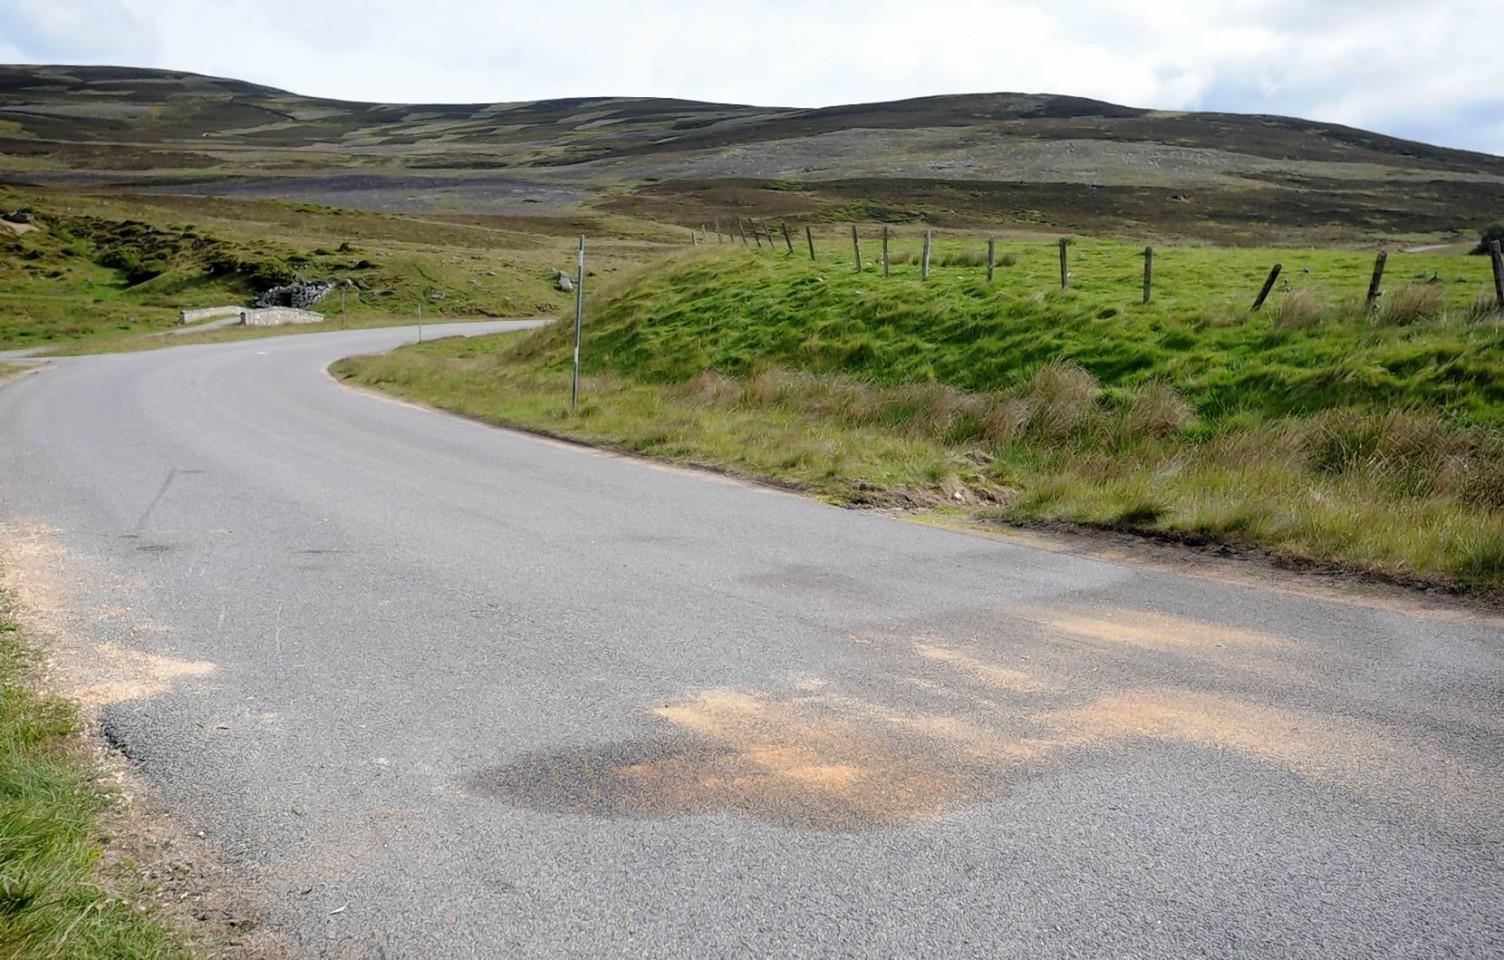 A939 near Gairnshiel road